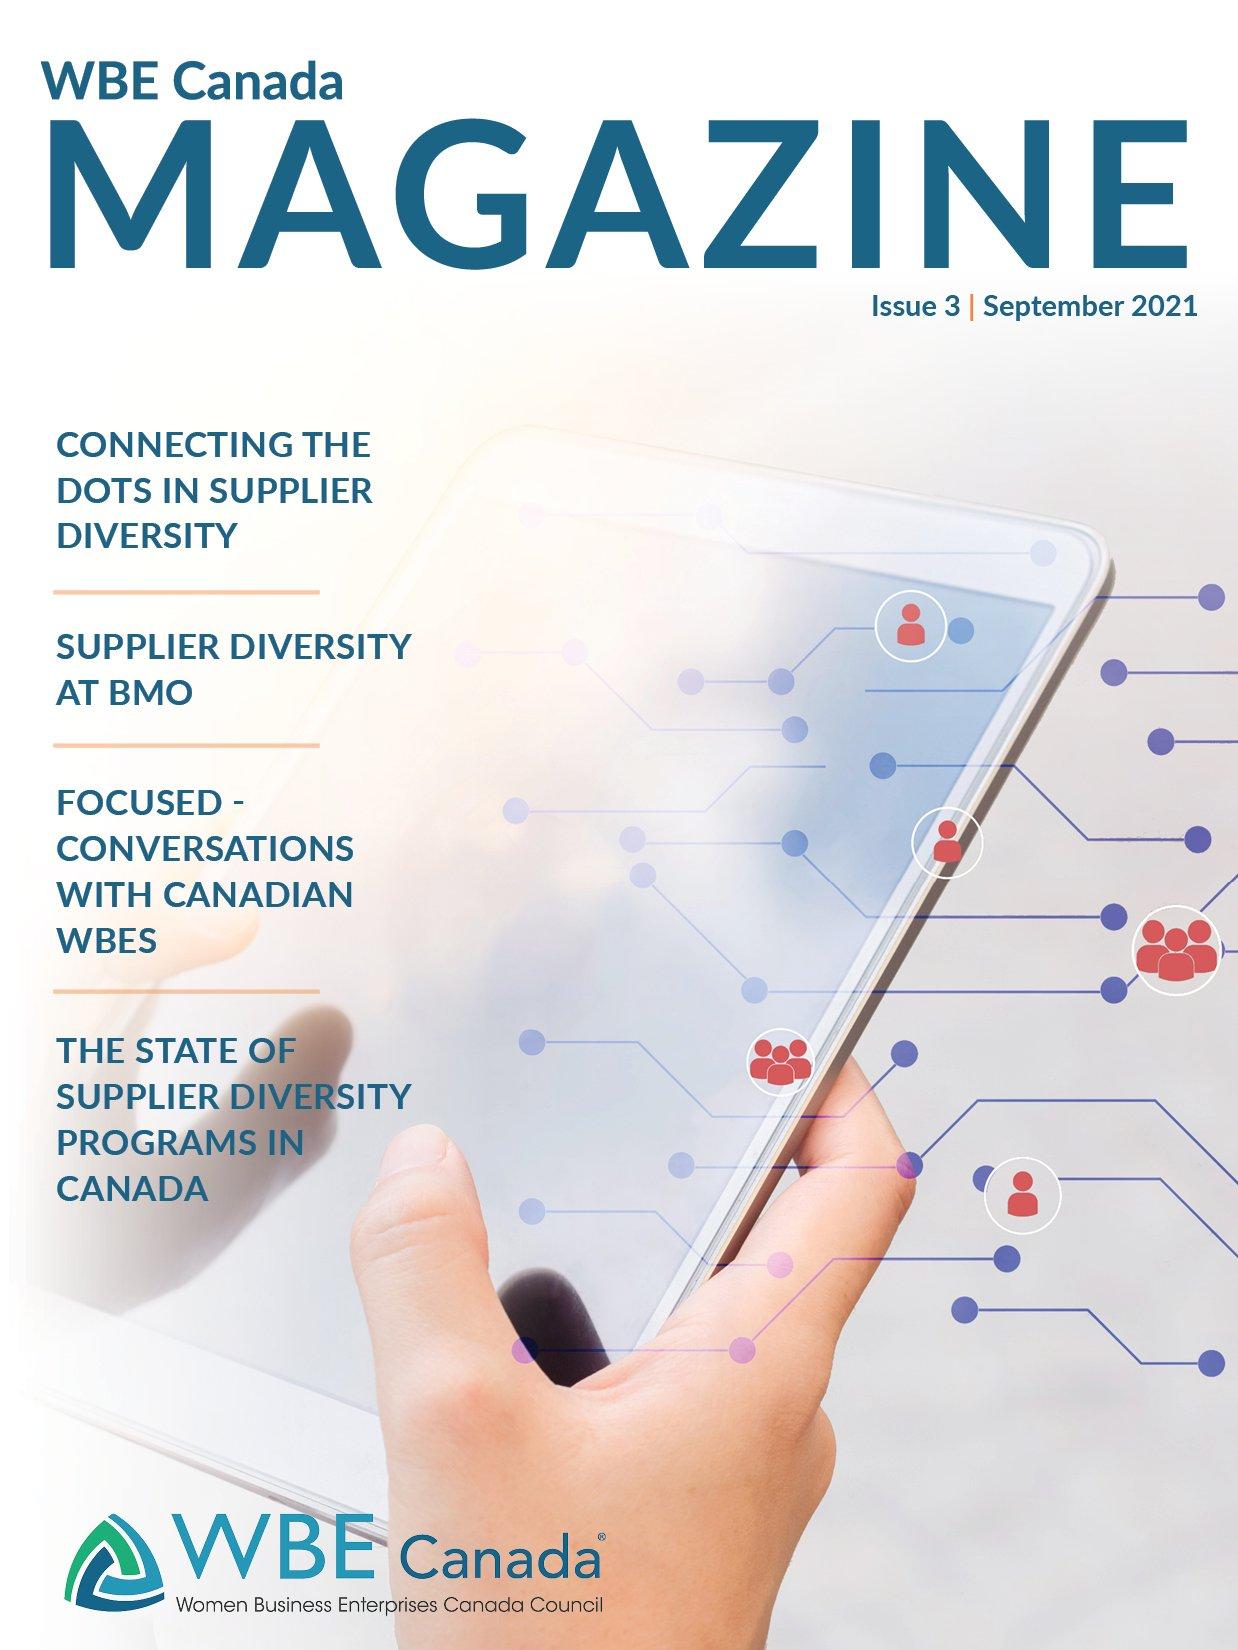 WBE Canada Magazine Issue 3_Cover